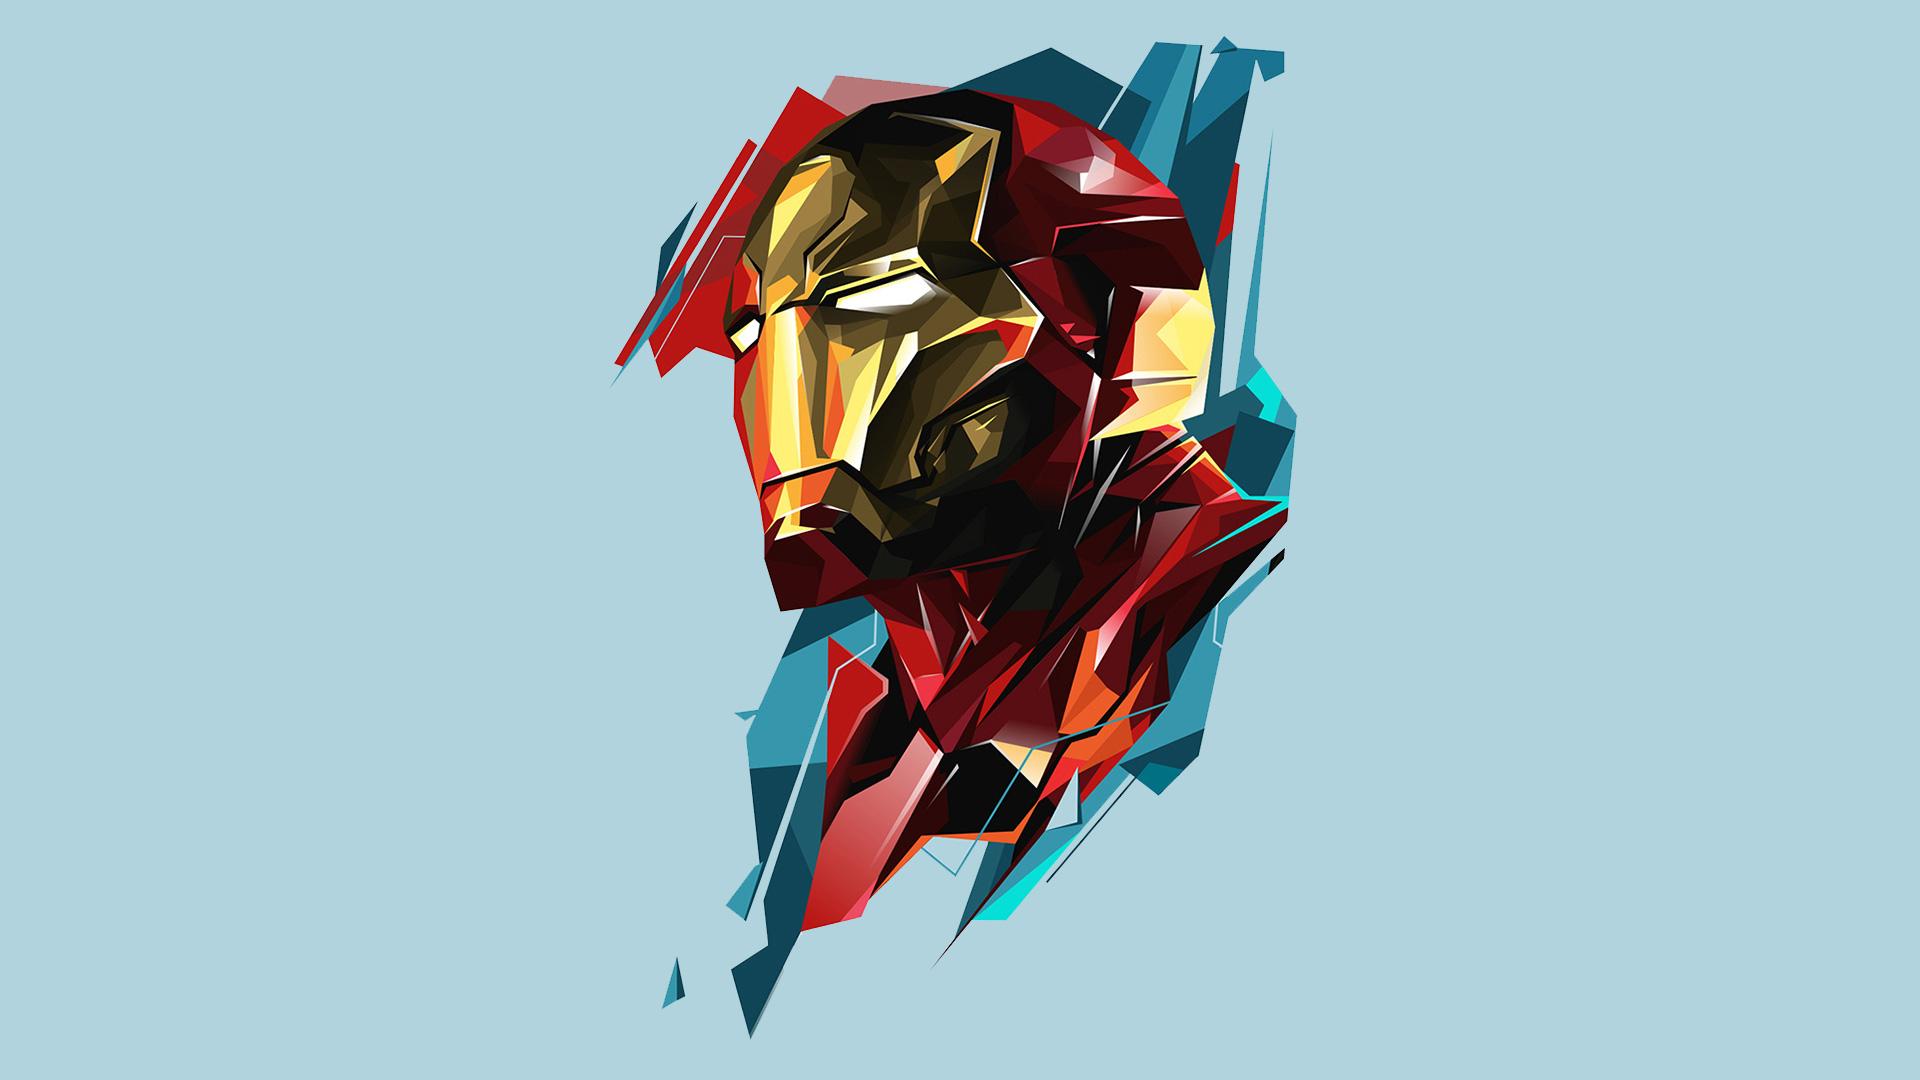 2048x1152 Iron Man Marvel Heroes Art